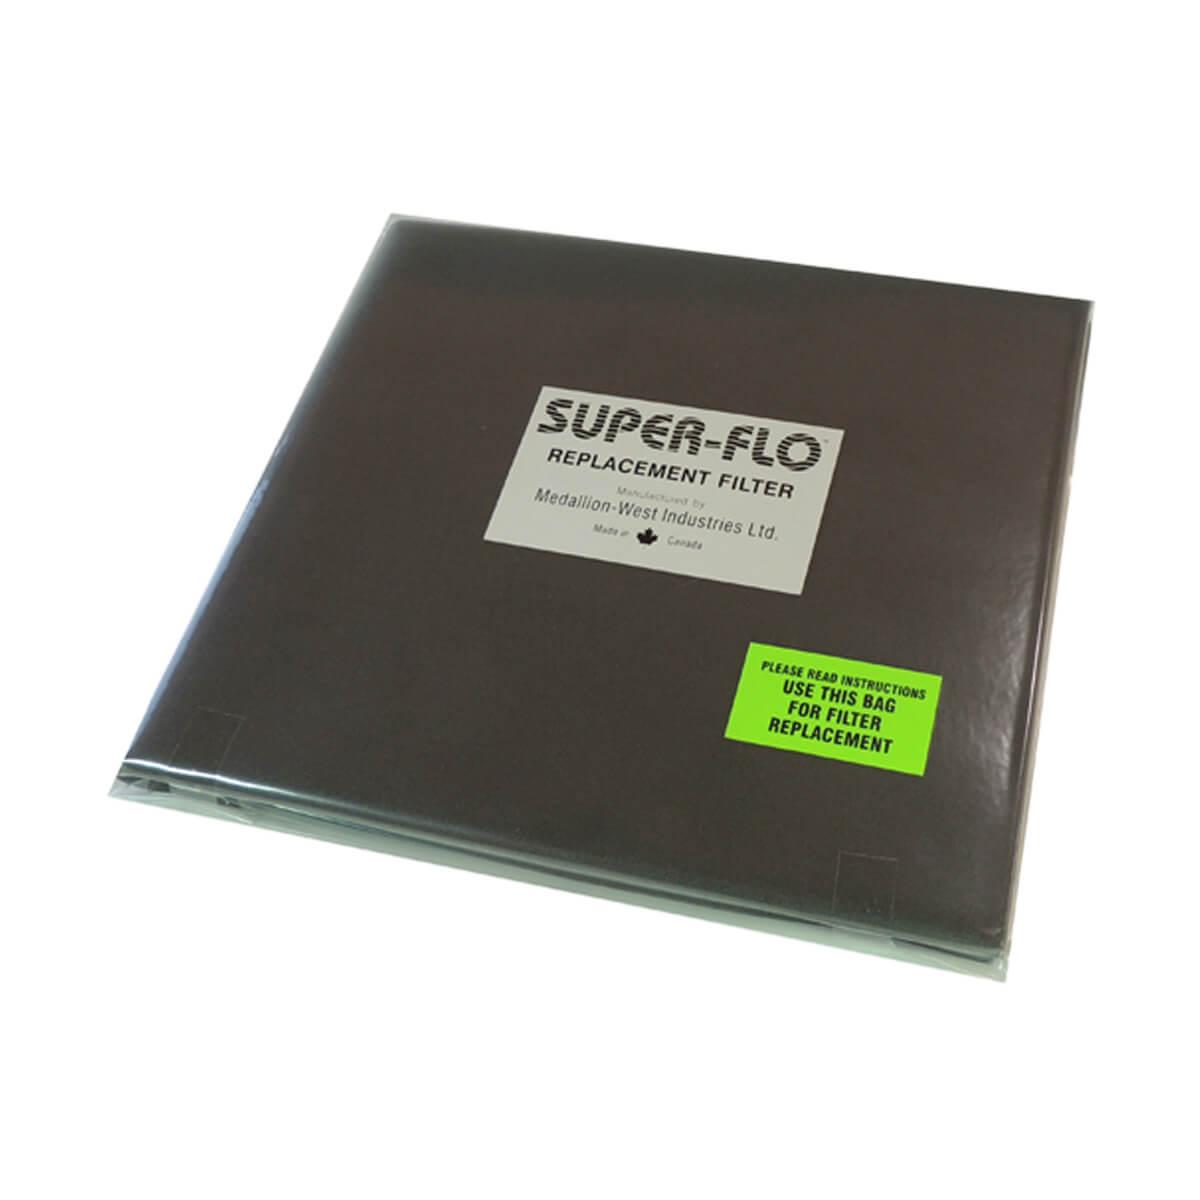 SUPER-FLO Replacement Foam